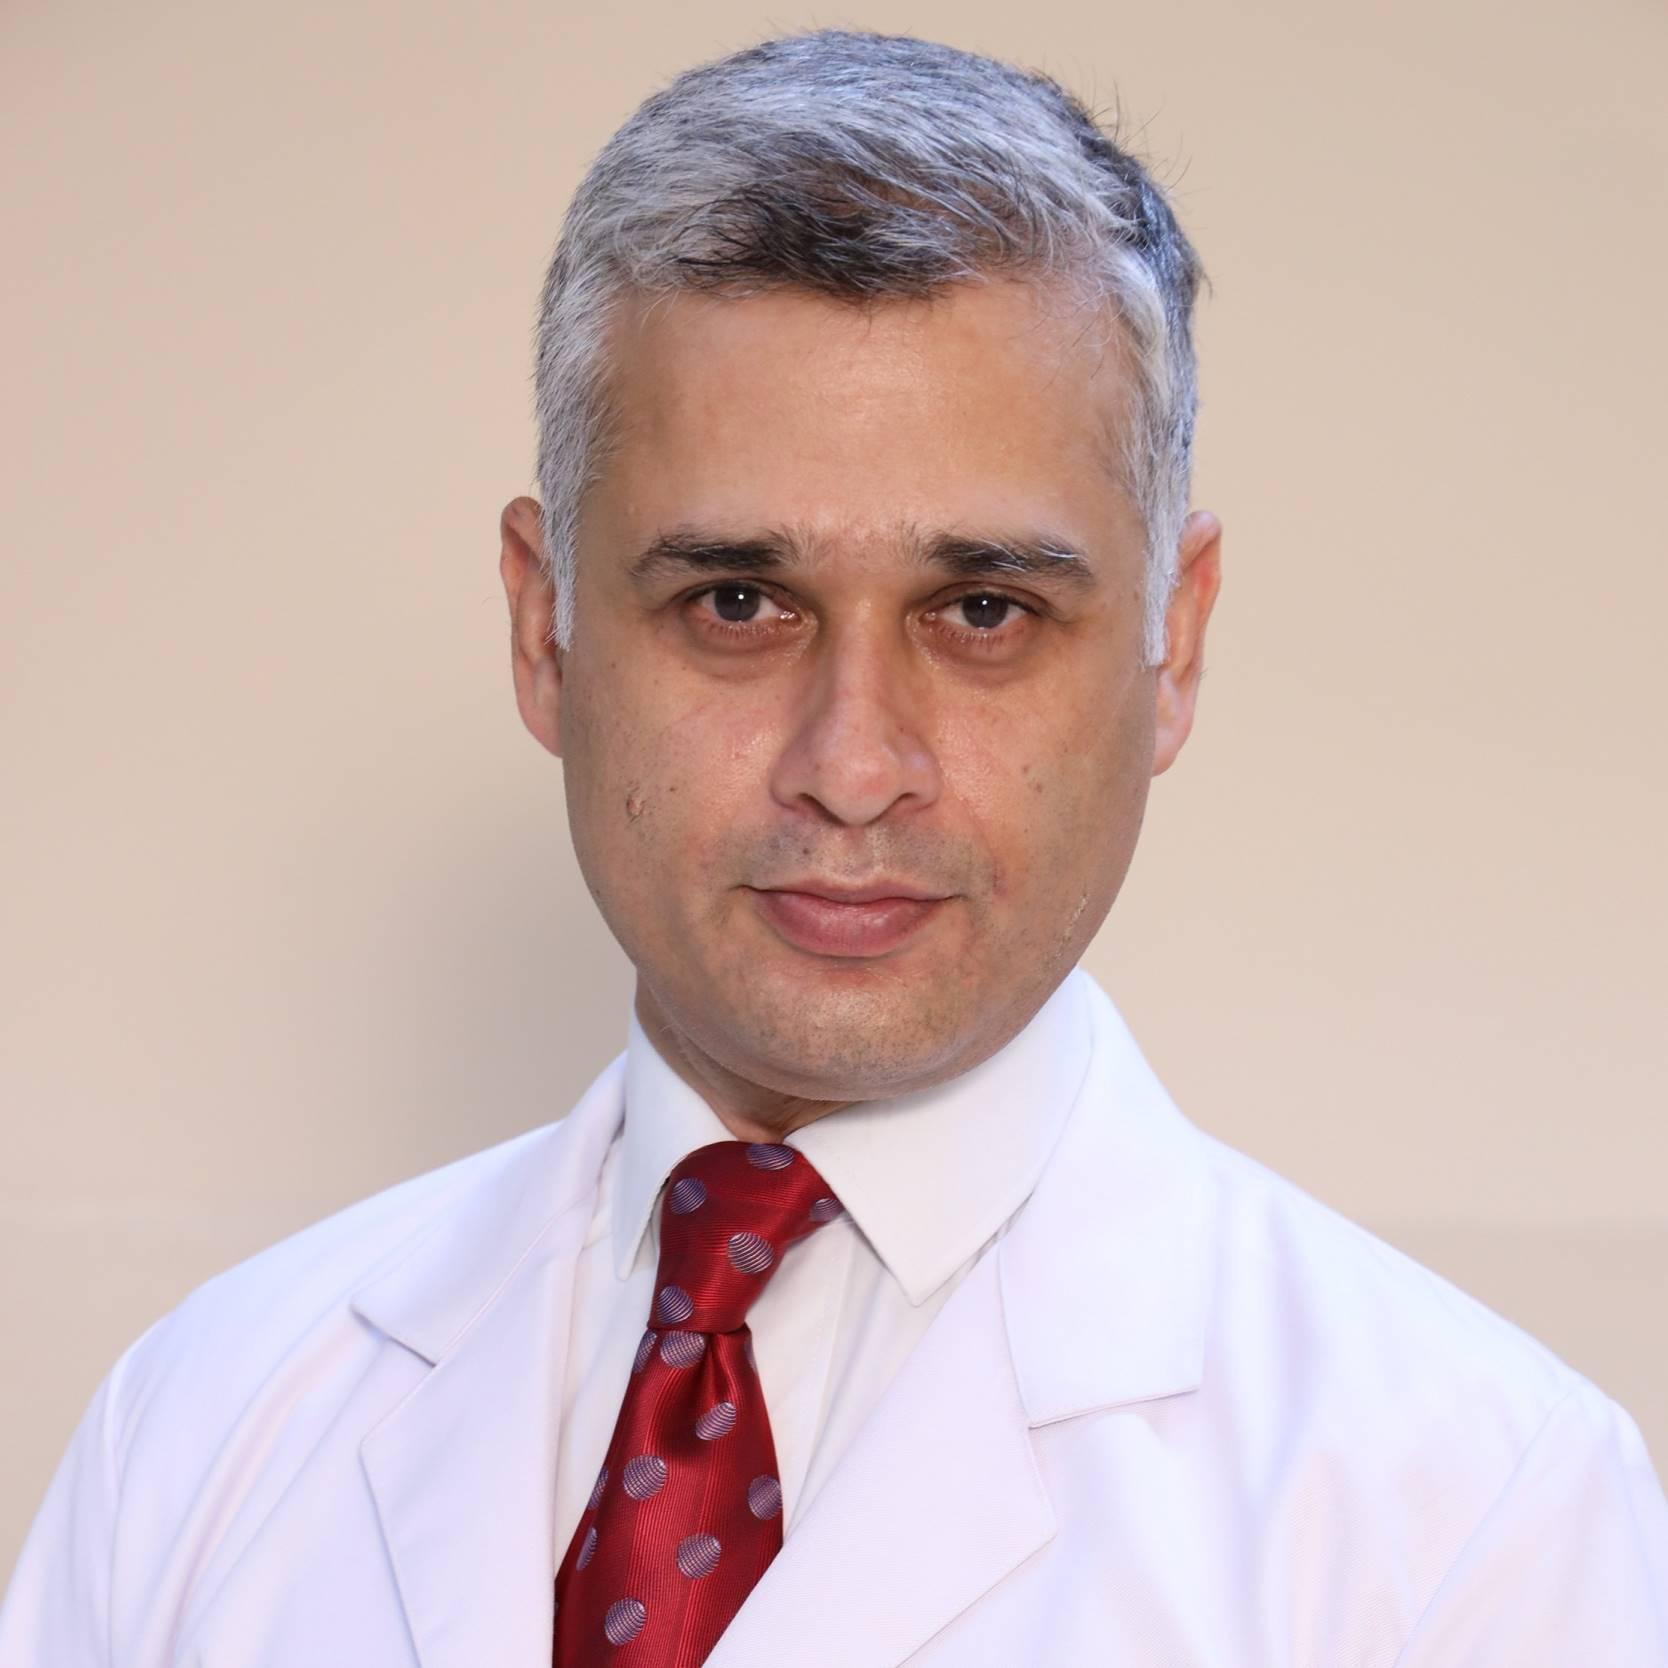 Dr. Ankur Ahuja